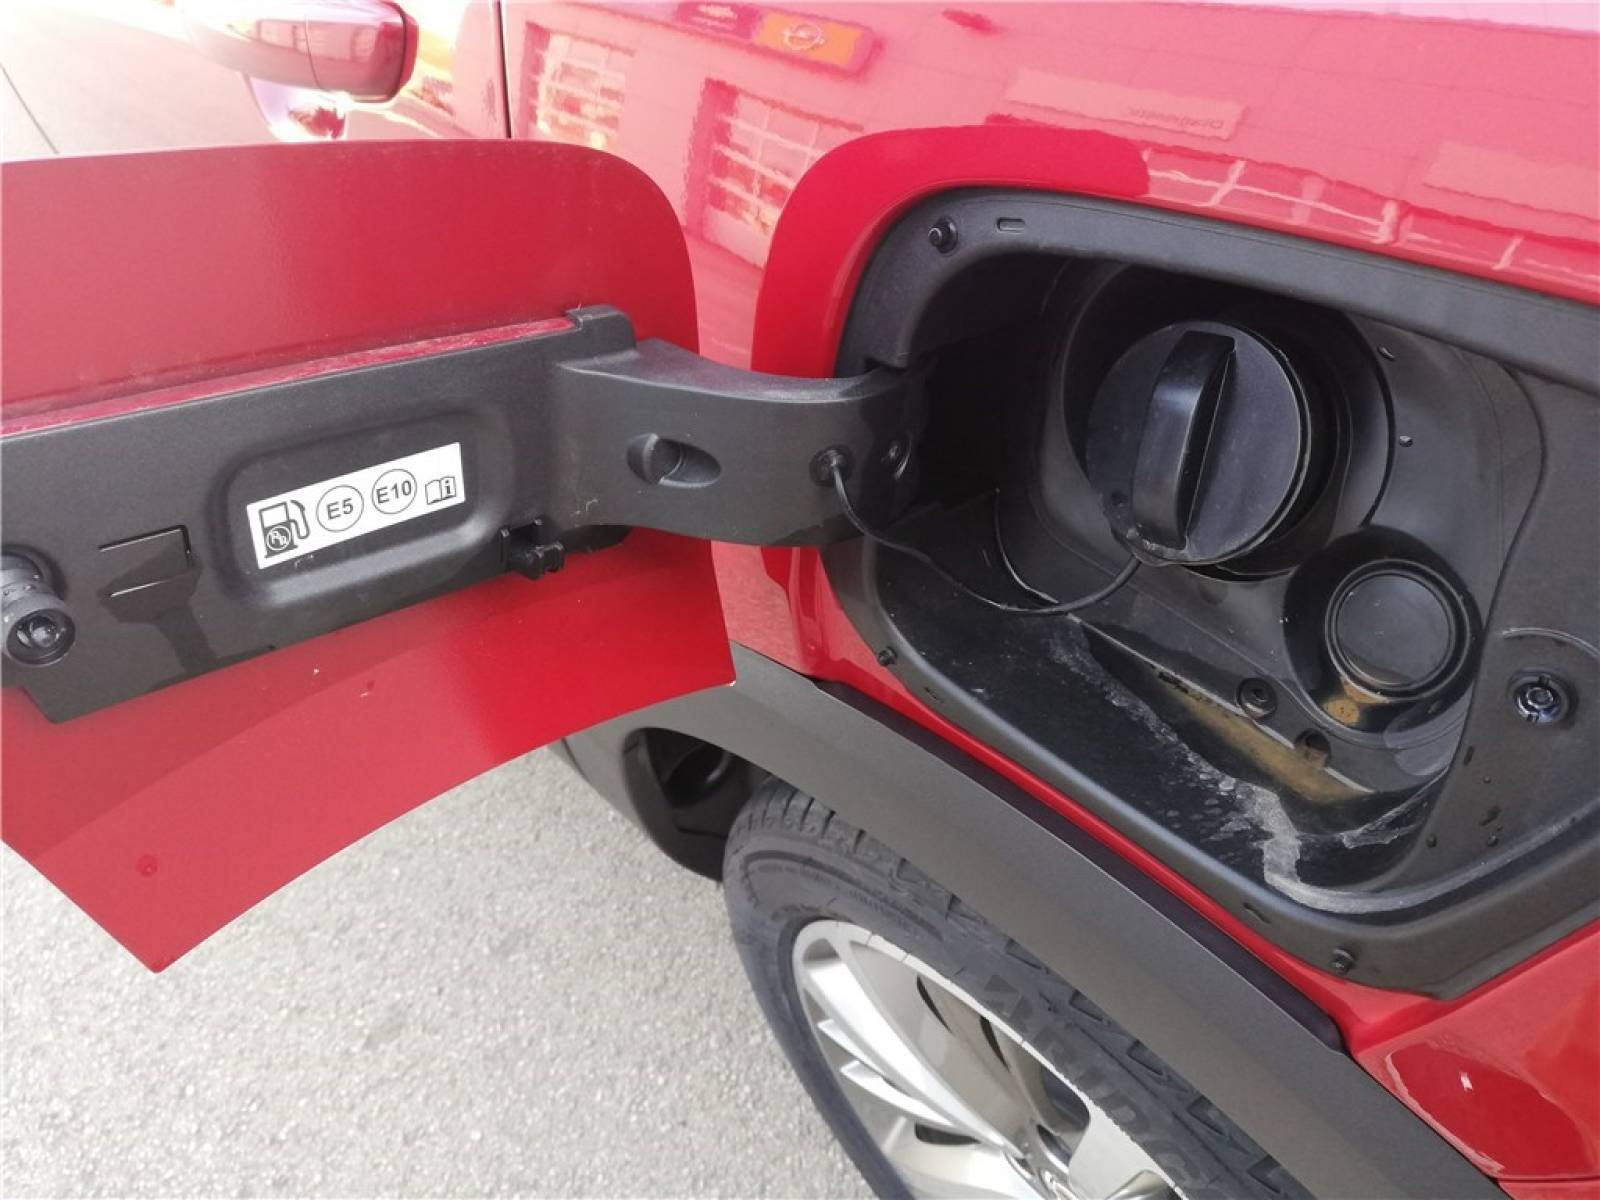 OPEL Crossland X 1.2 Turbo 110 ch - véhicule d'occasion - Groupe Guillet - Opel Magicauto - Chalon-sur-Saône - 71380 - Saint-Marcel - 7